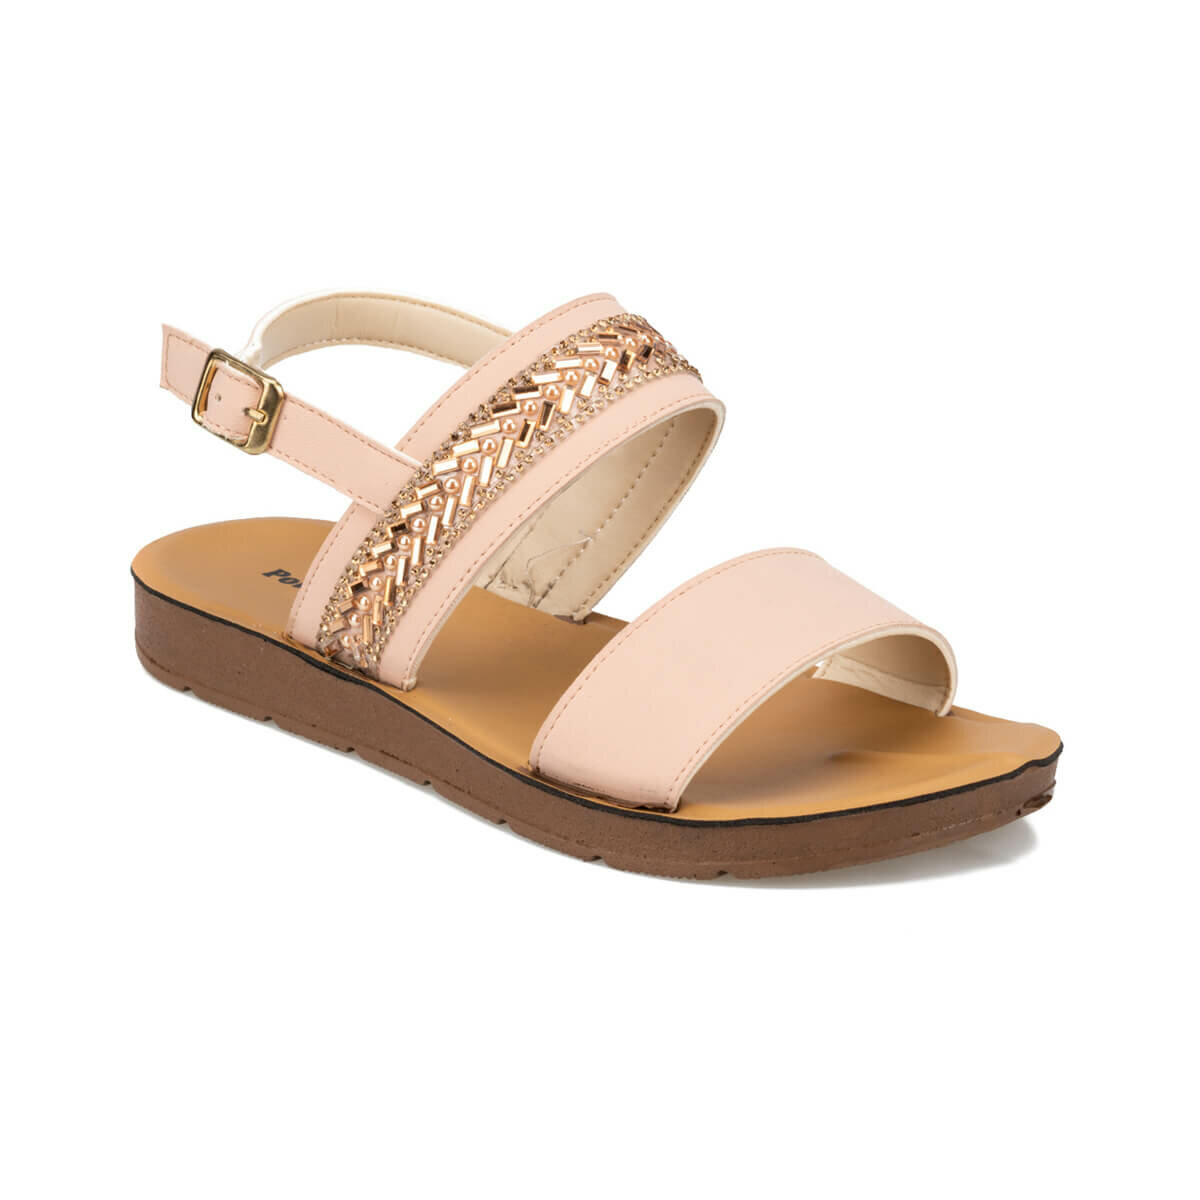 FLO 91.313610.Z Powder Women 'S Sandals Polaris